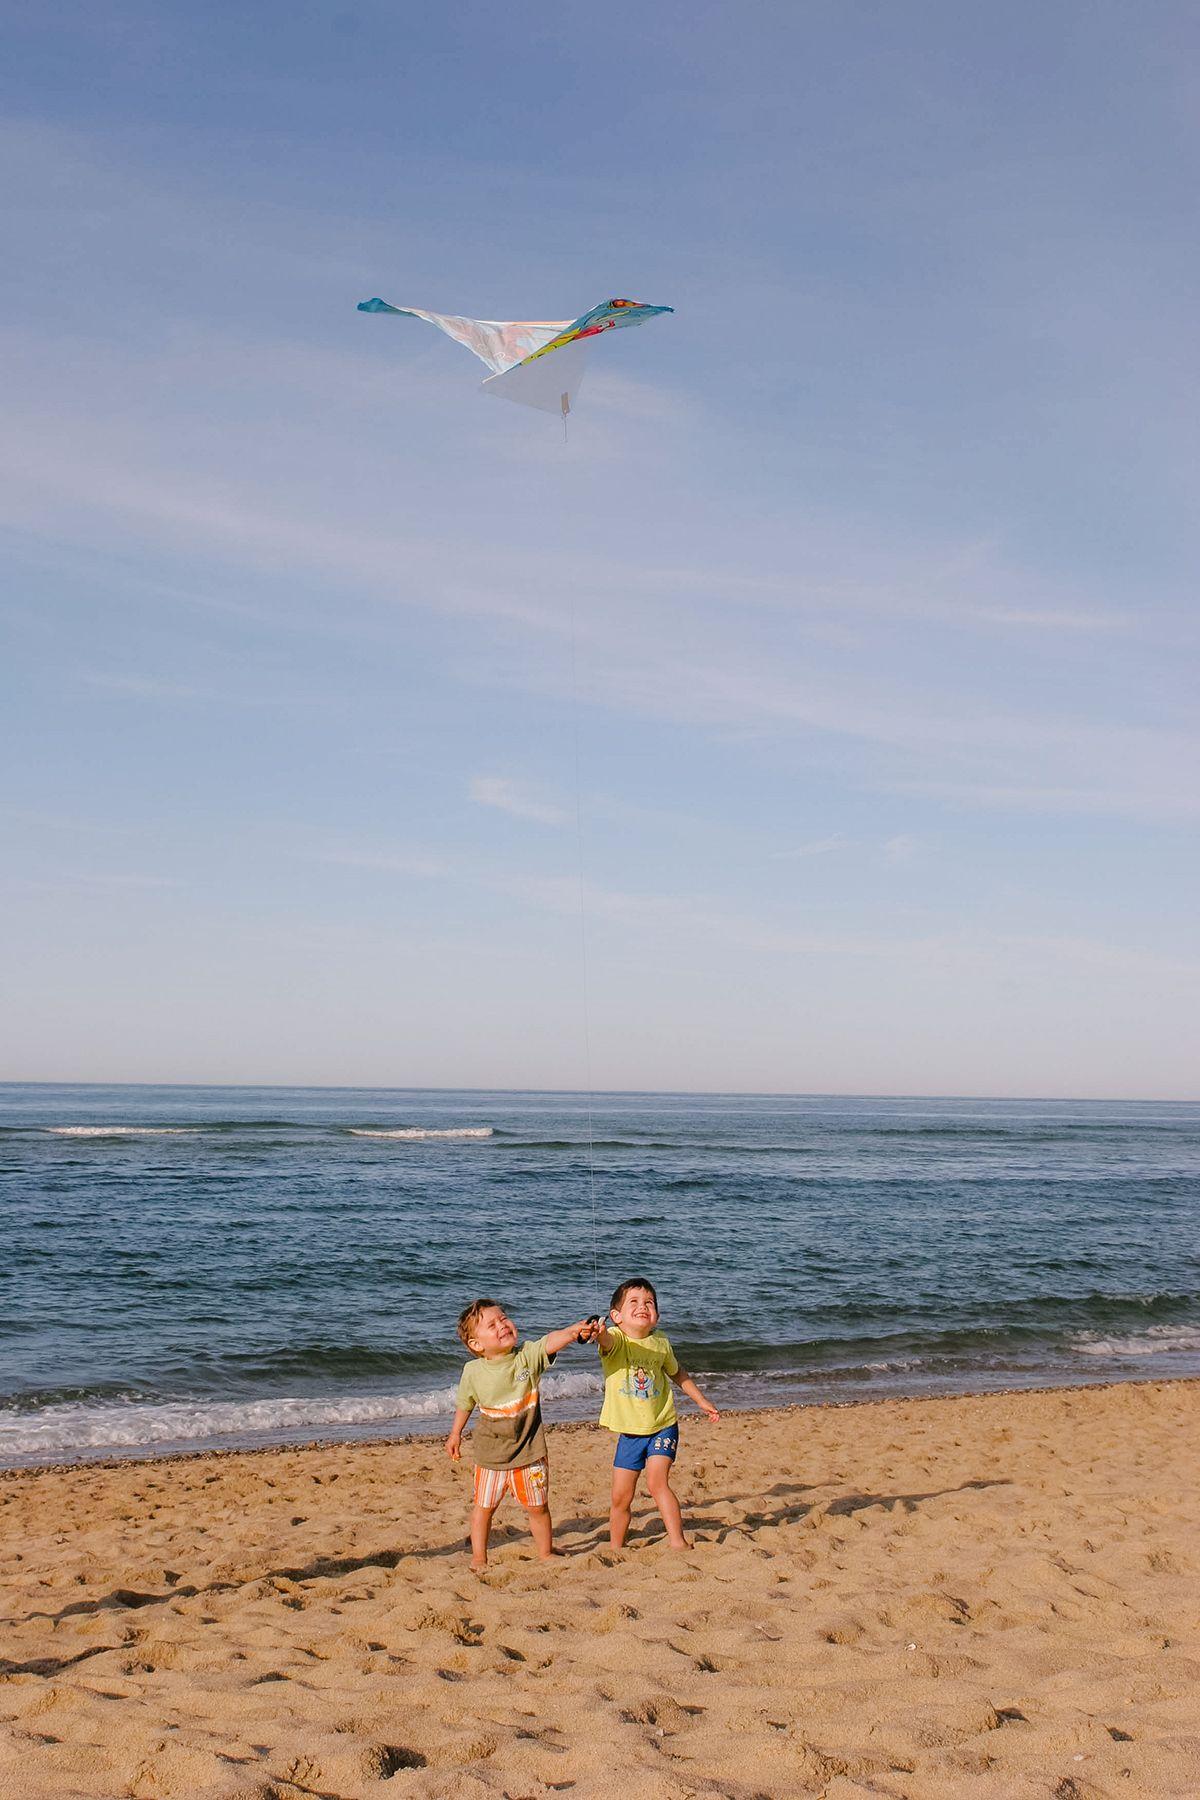 Kite on a Beach